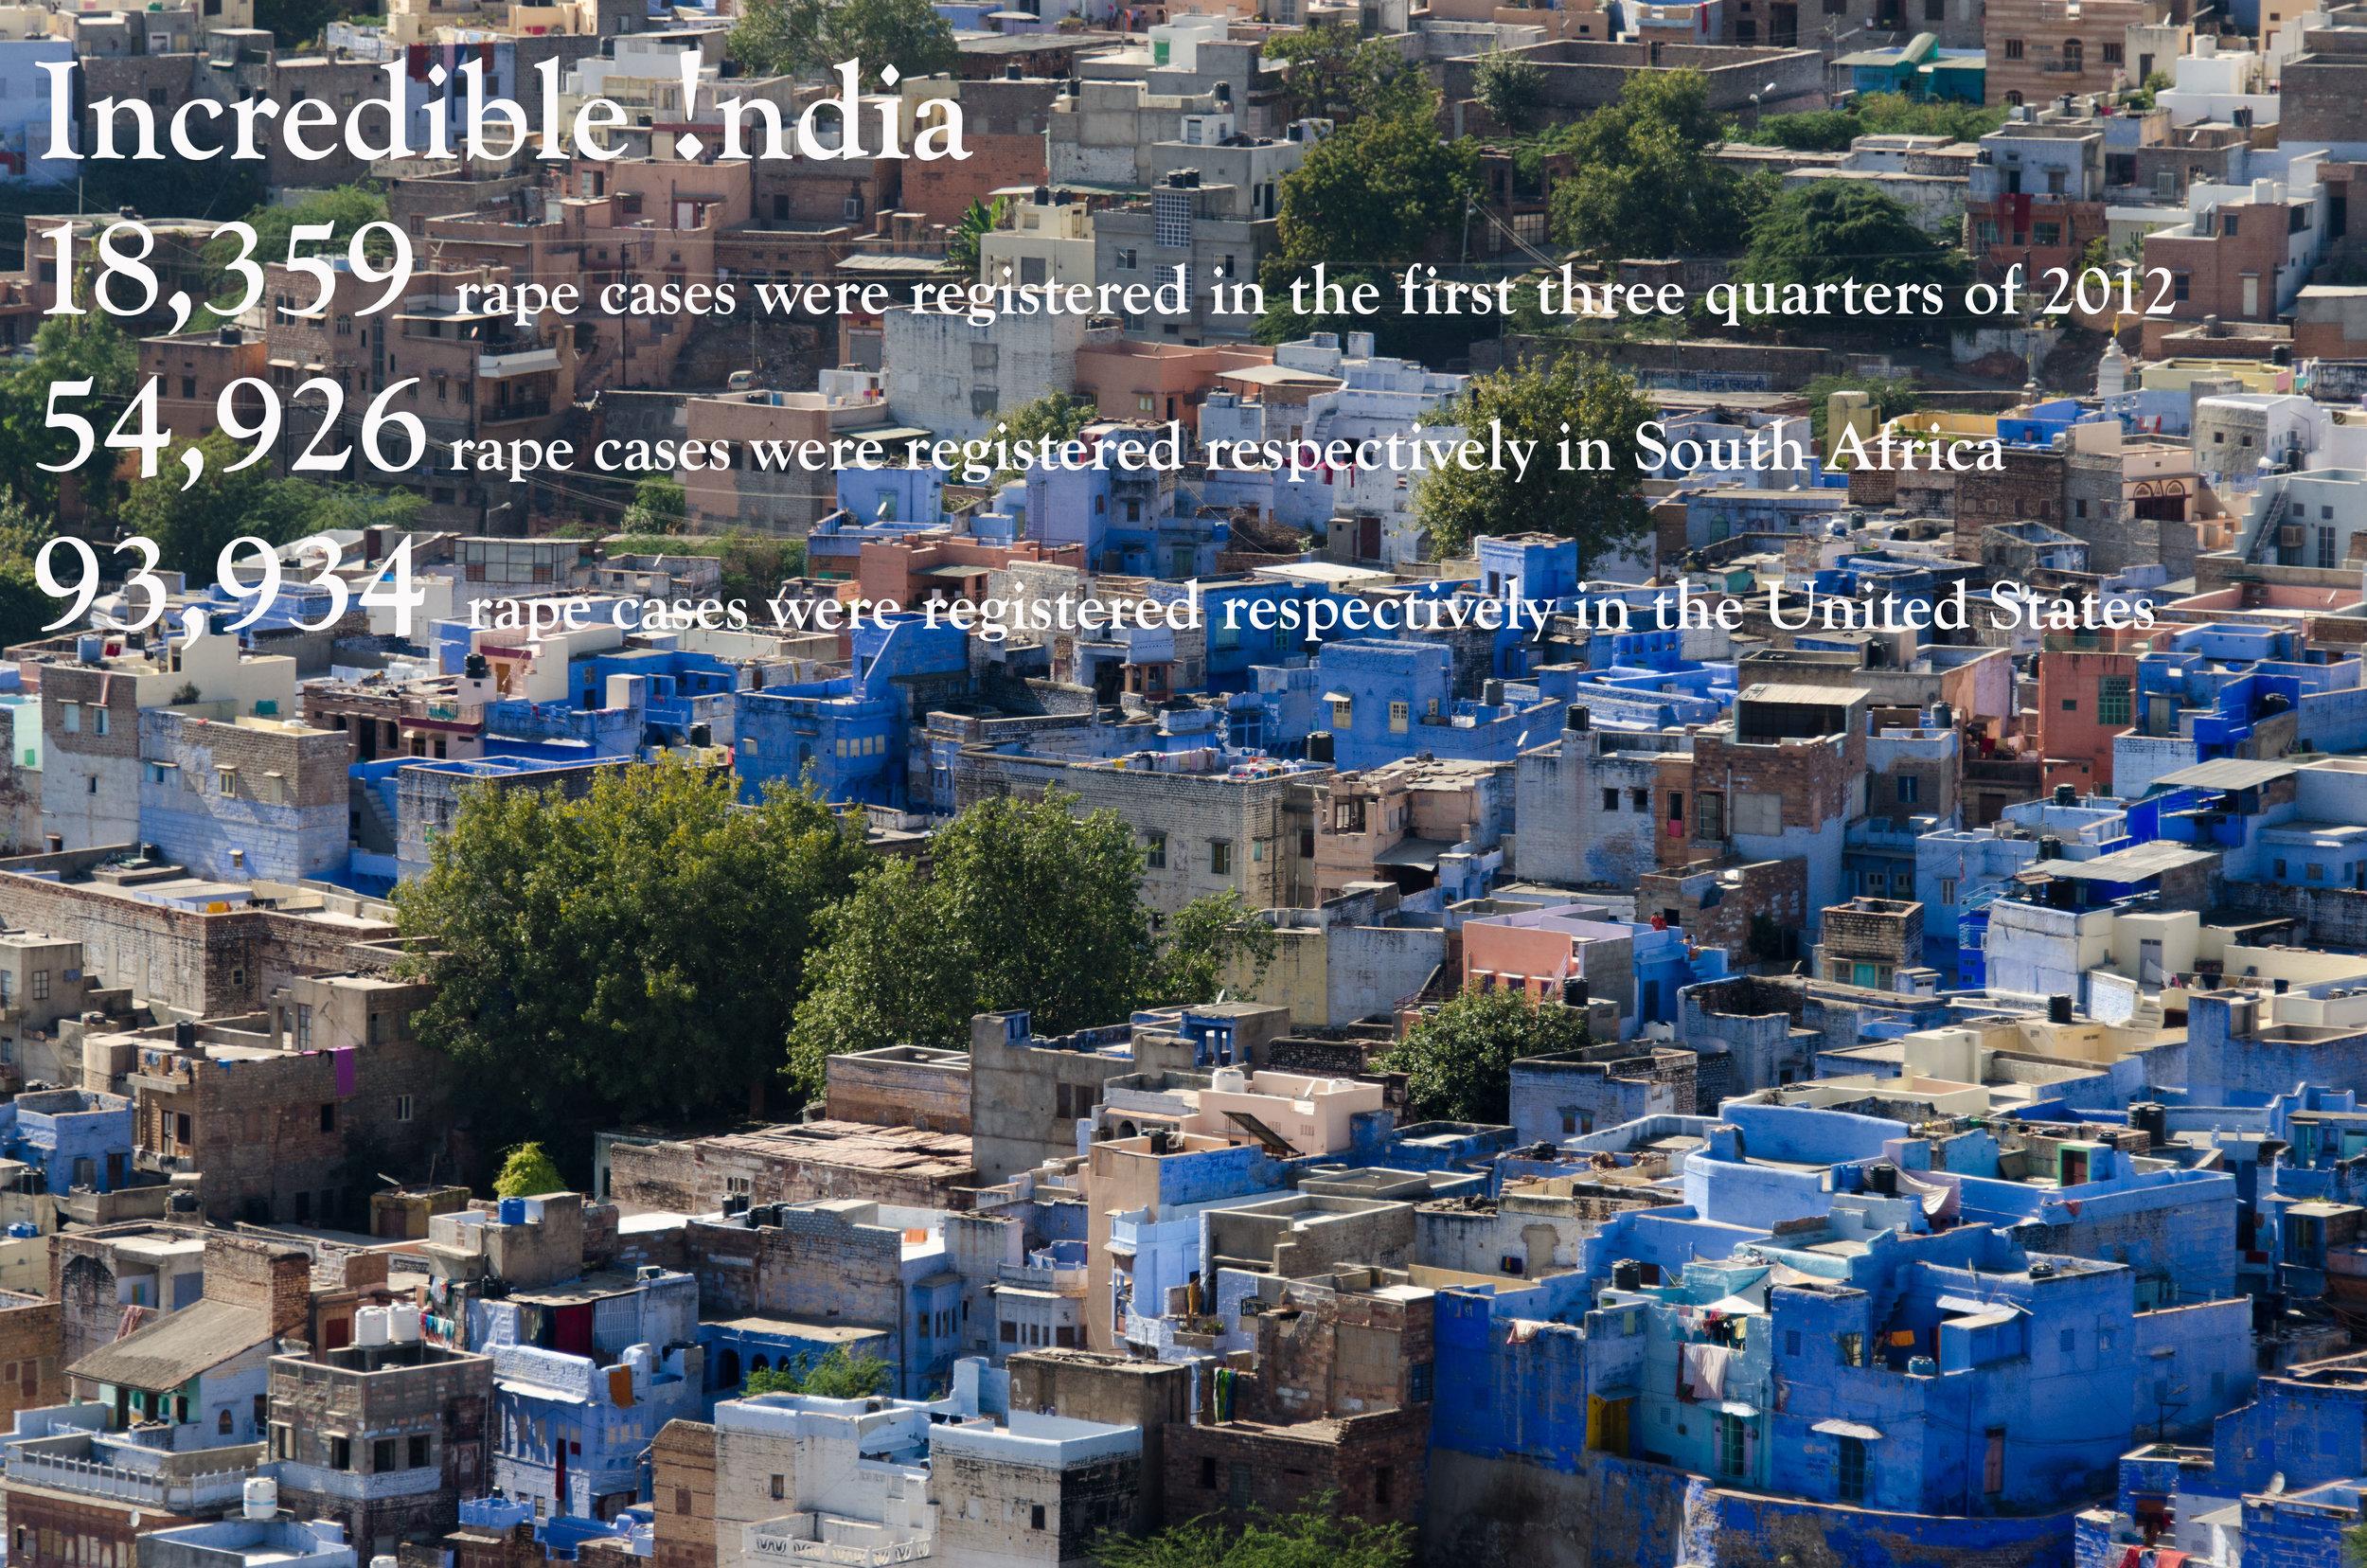 Incredible India3.jpg